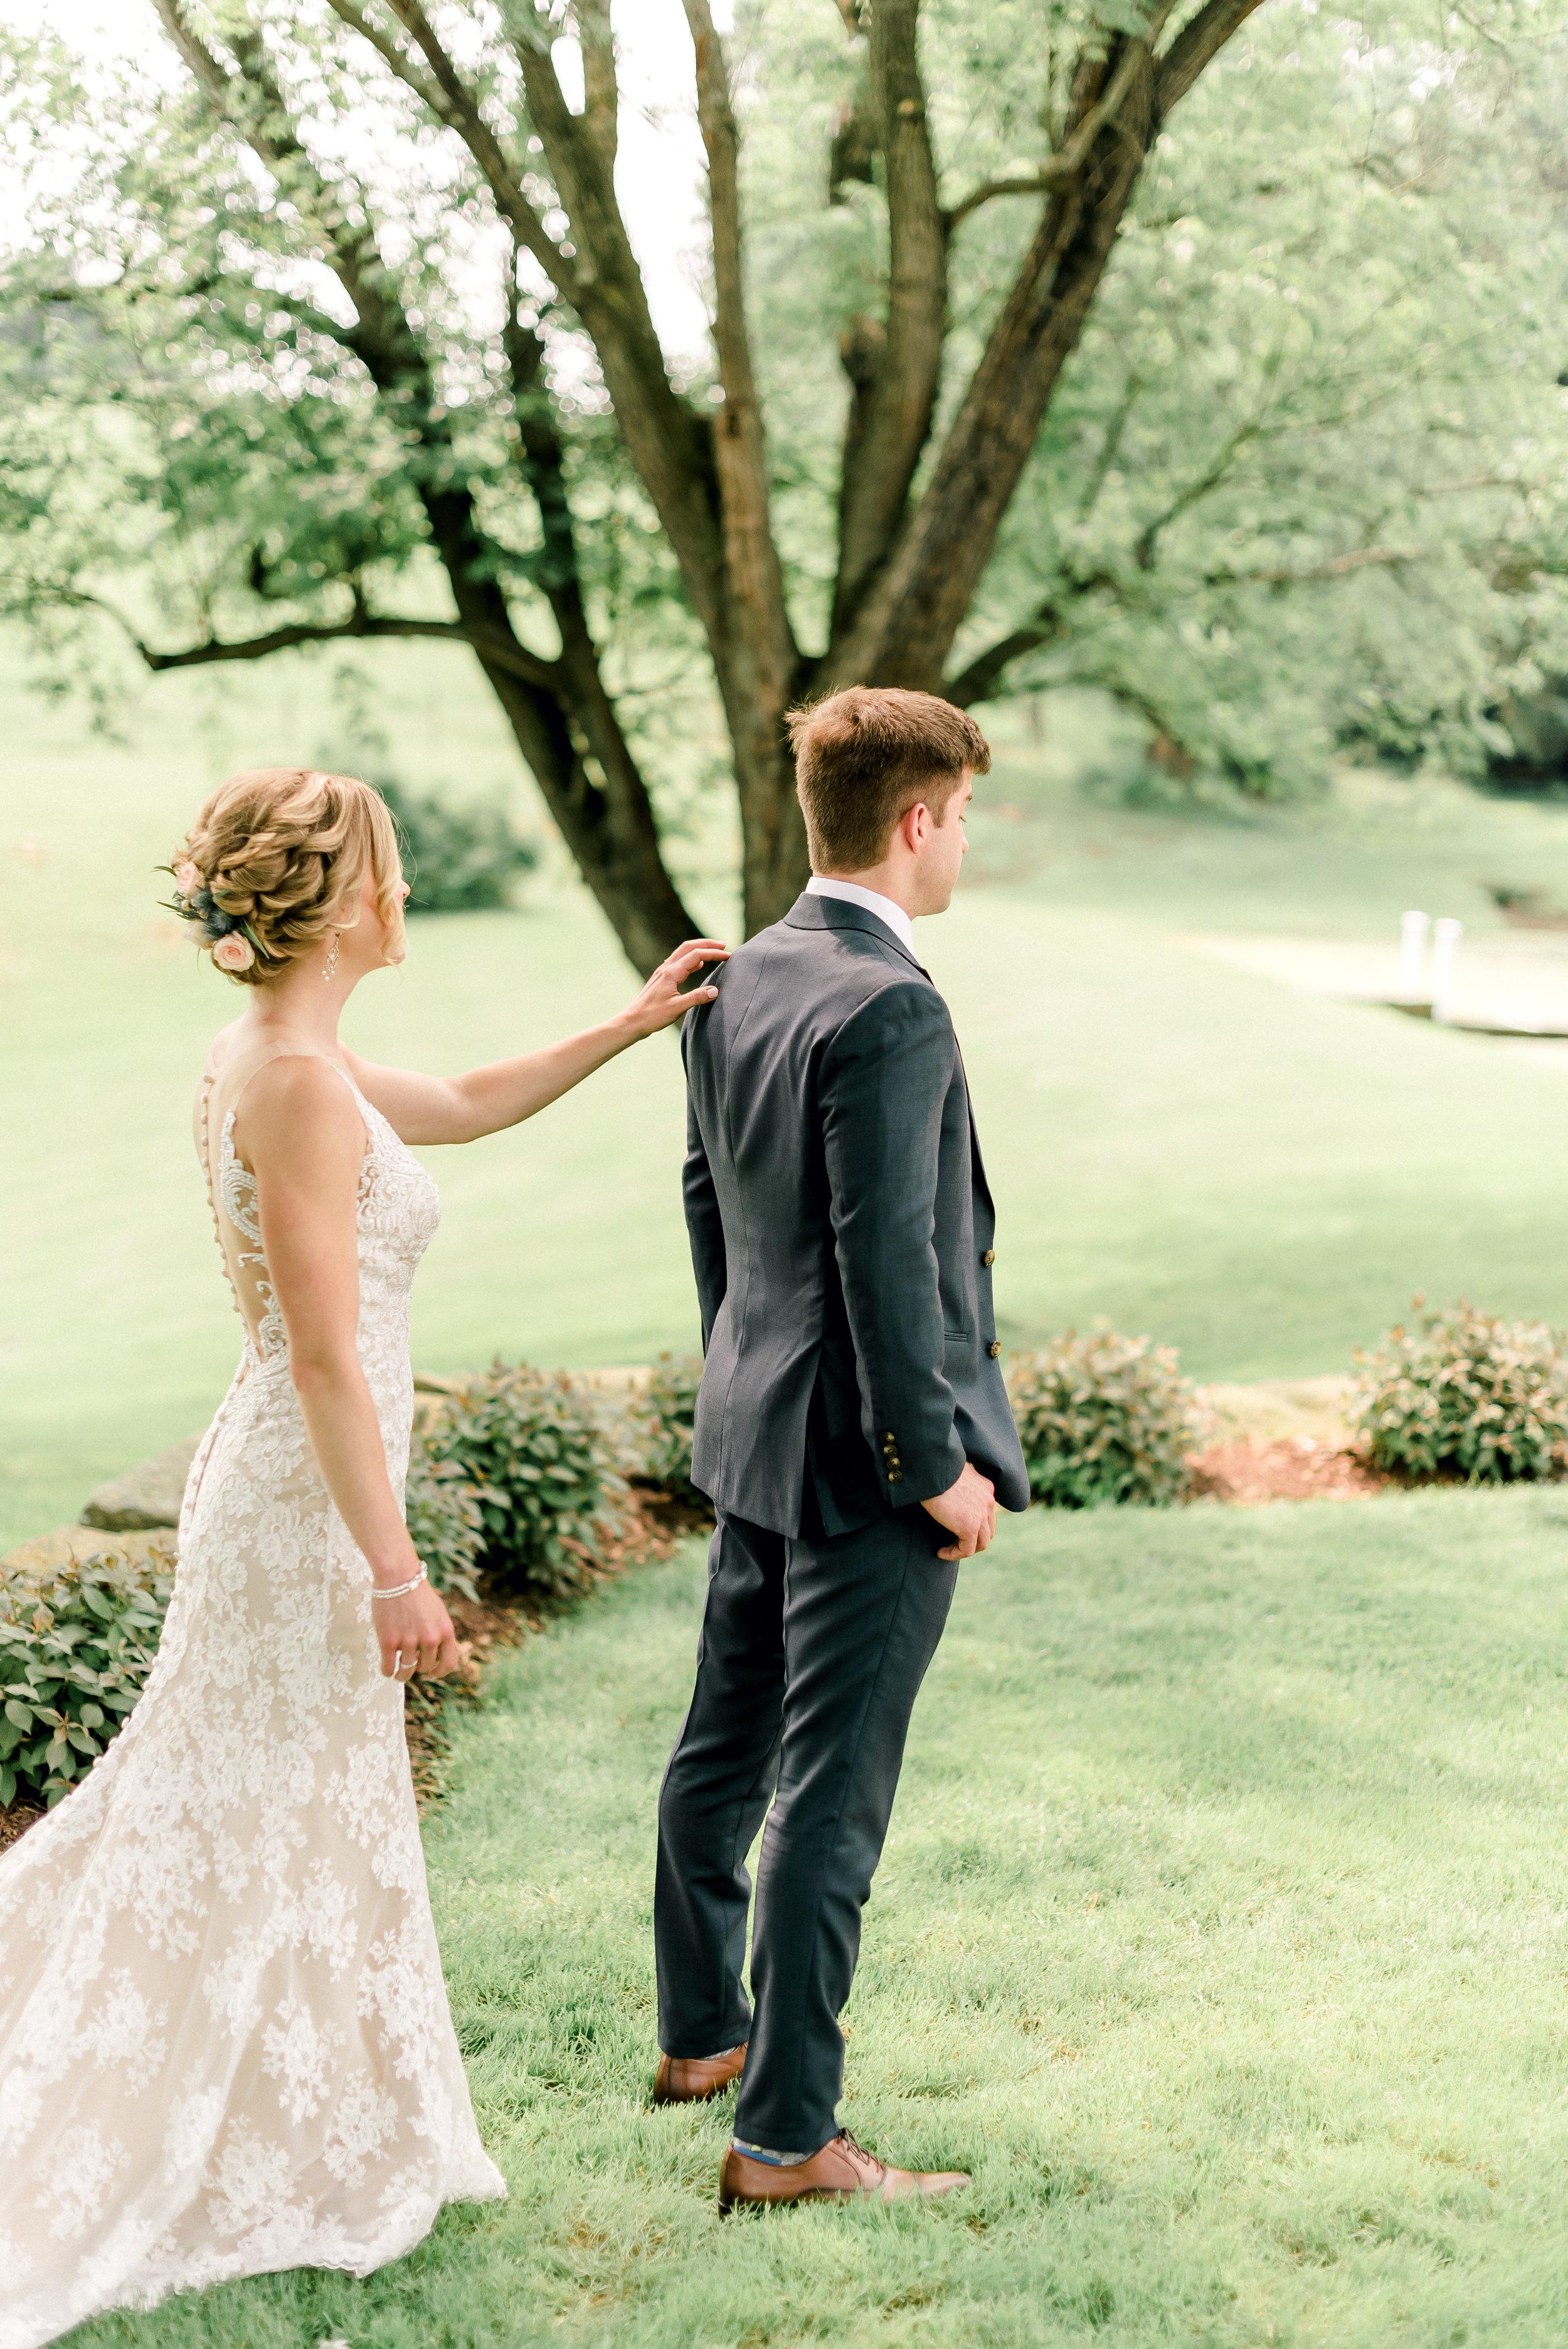 pittsburgh-wedding-photographer-shady-elms-farm-0014.jpg